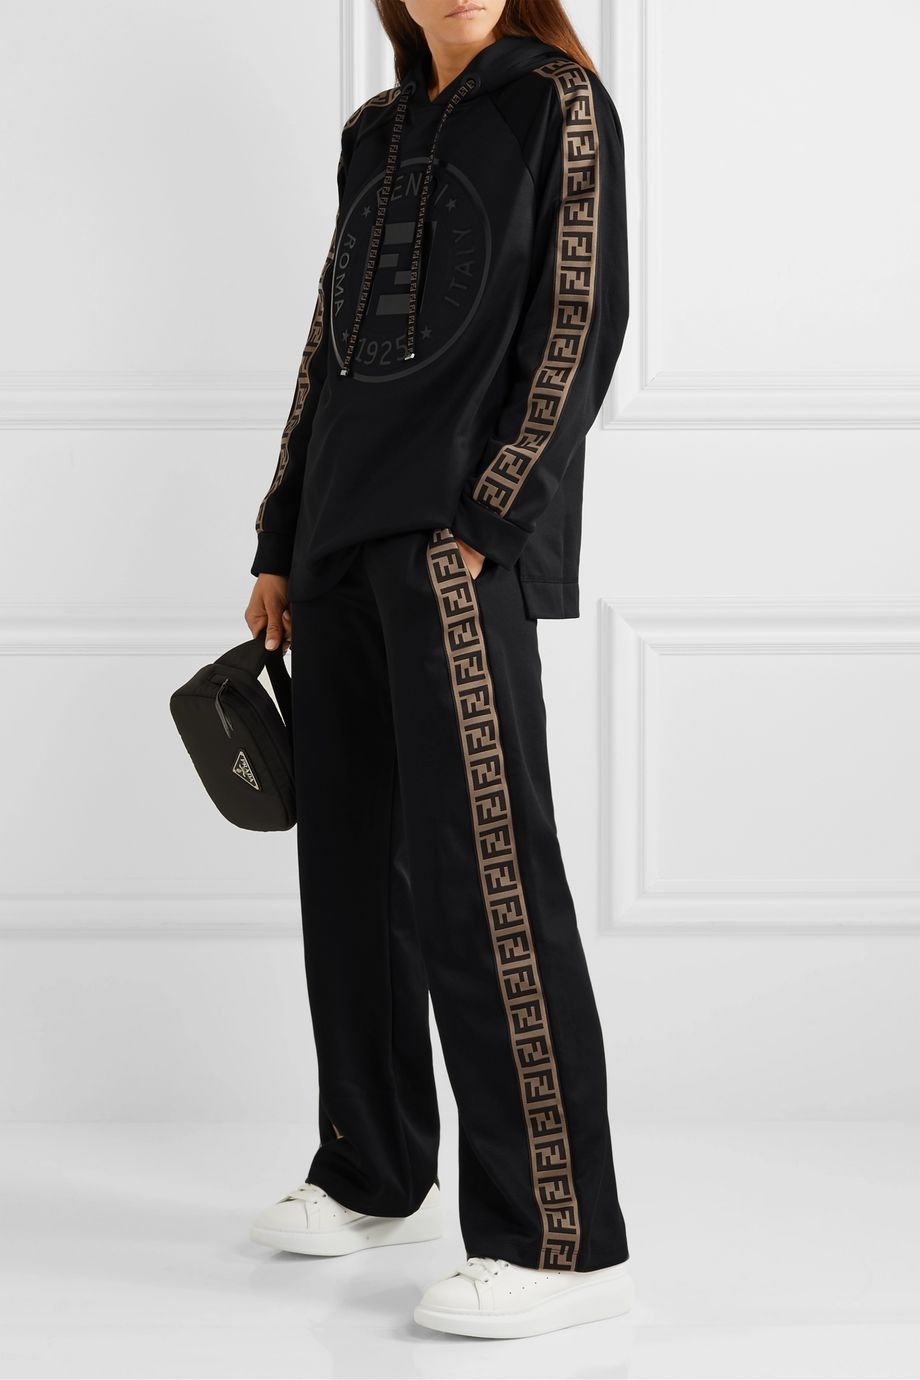 Fendi Fendirama printed jacquard-trimmed satin-jersey hoodie